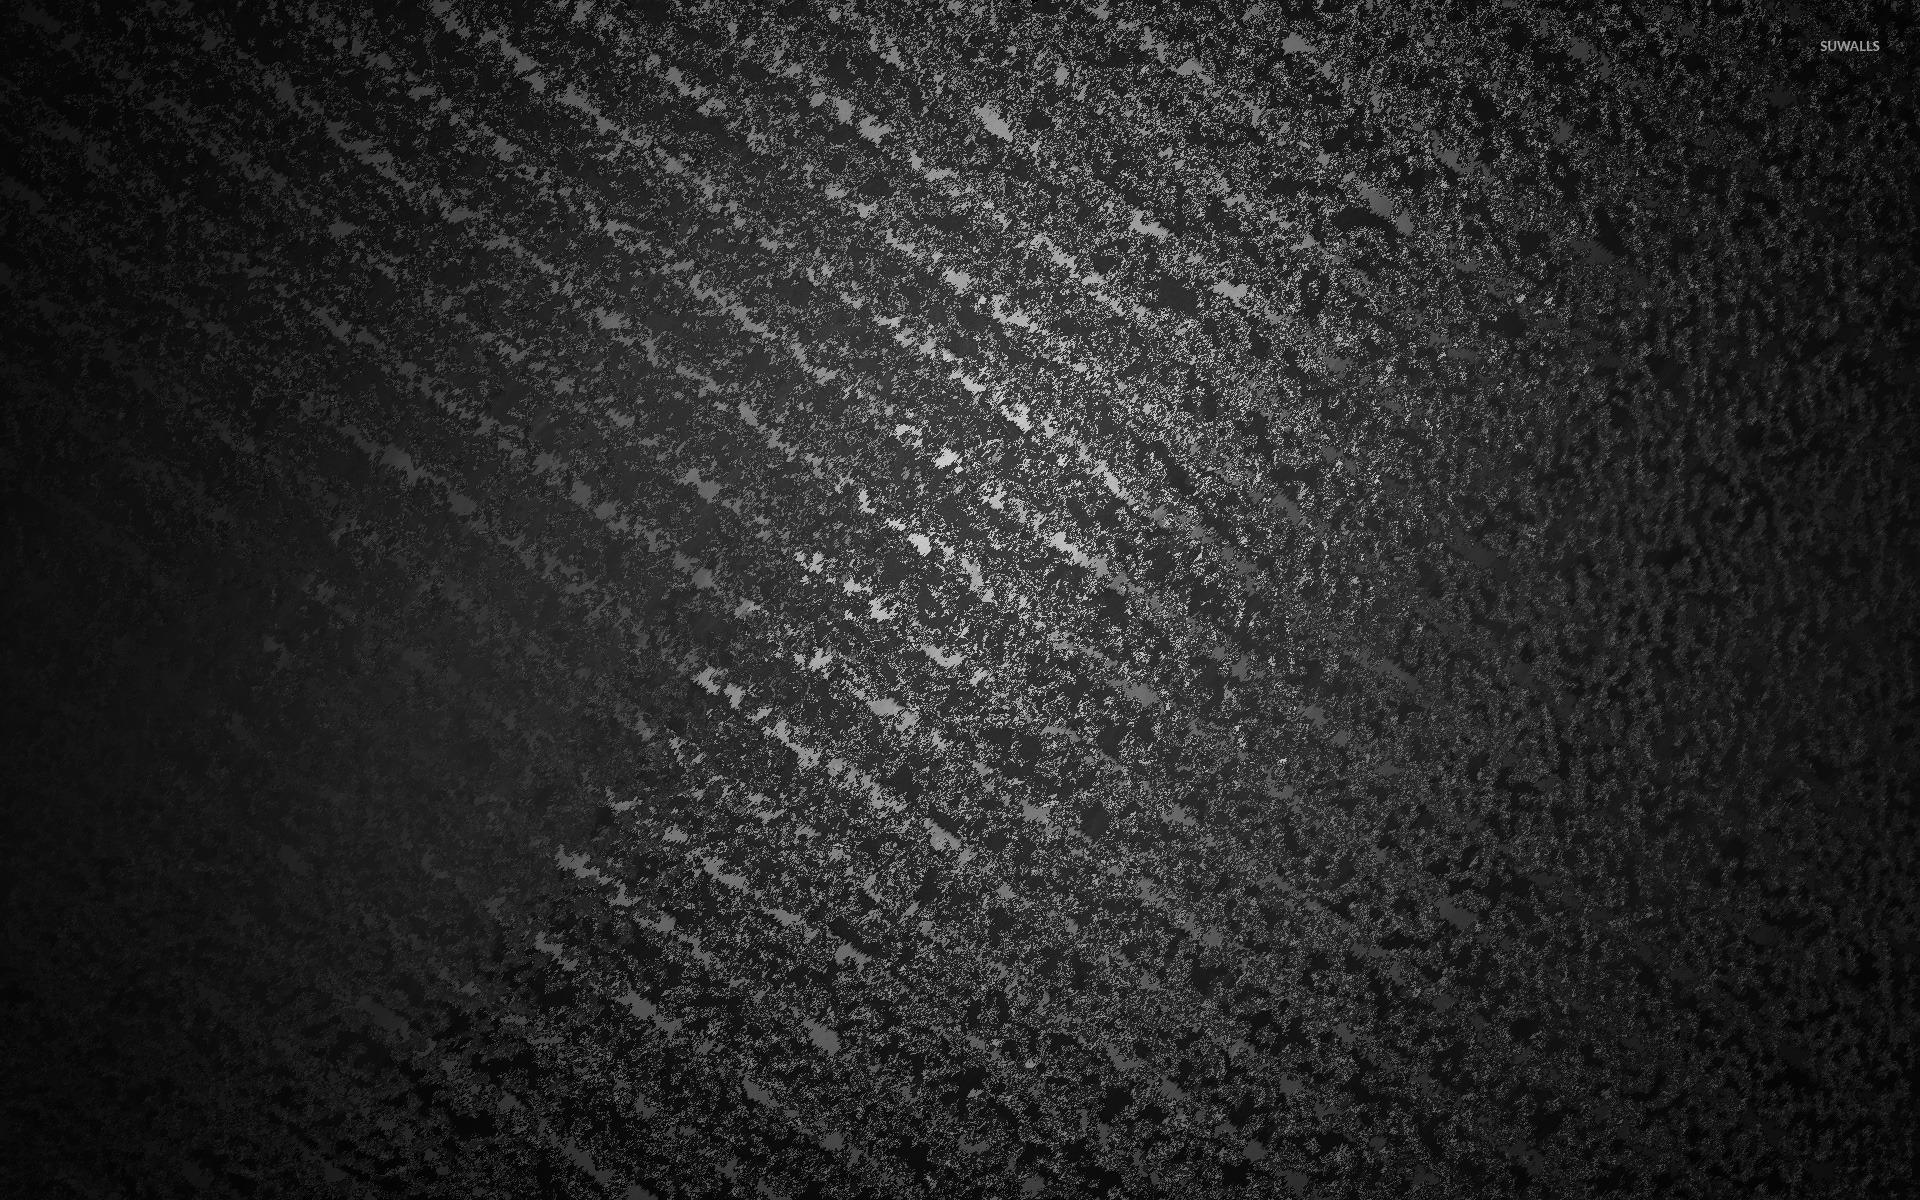 Metallic texture wallpaper abstract wallpapers 25880 for Metallic wallpaper